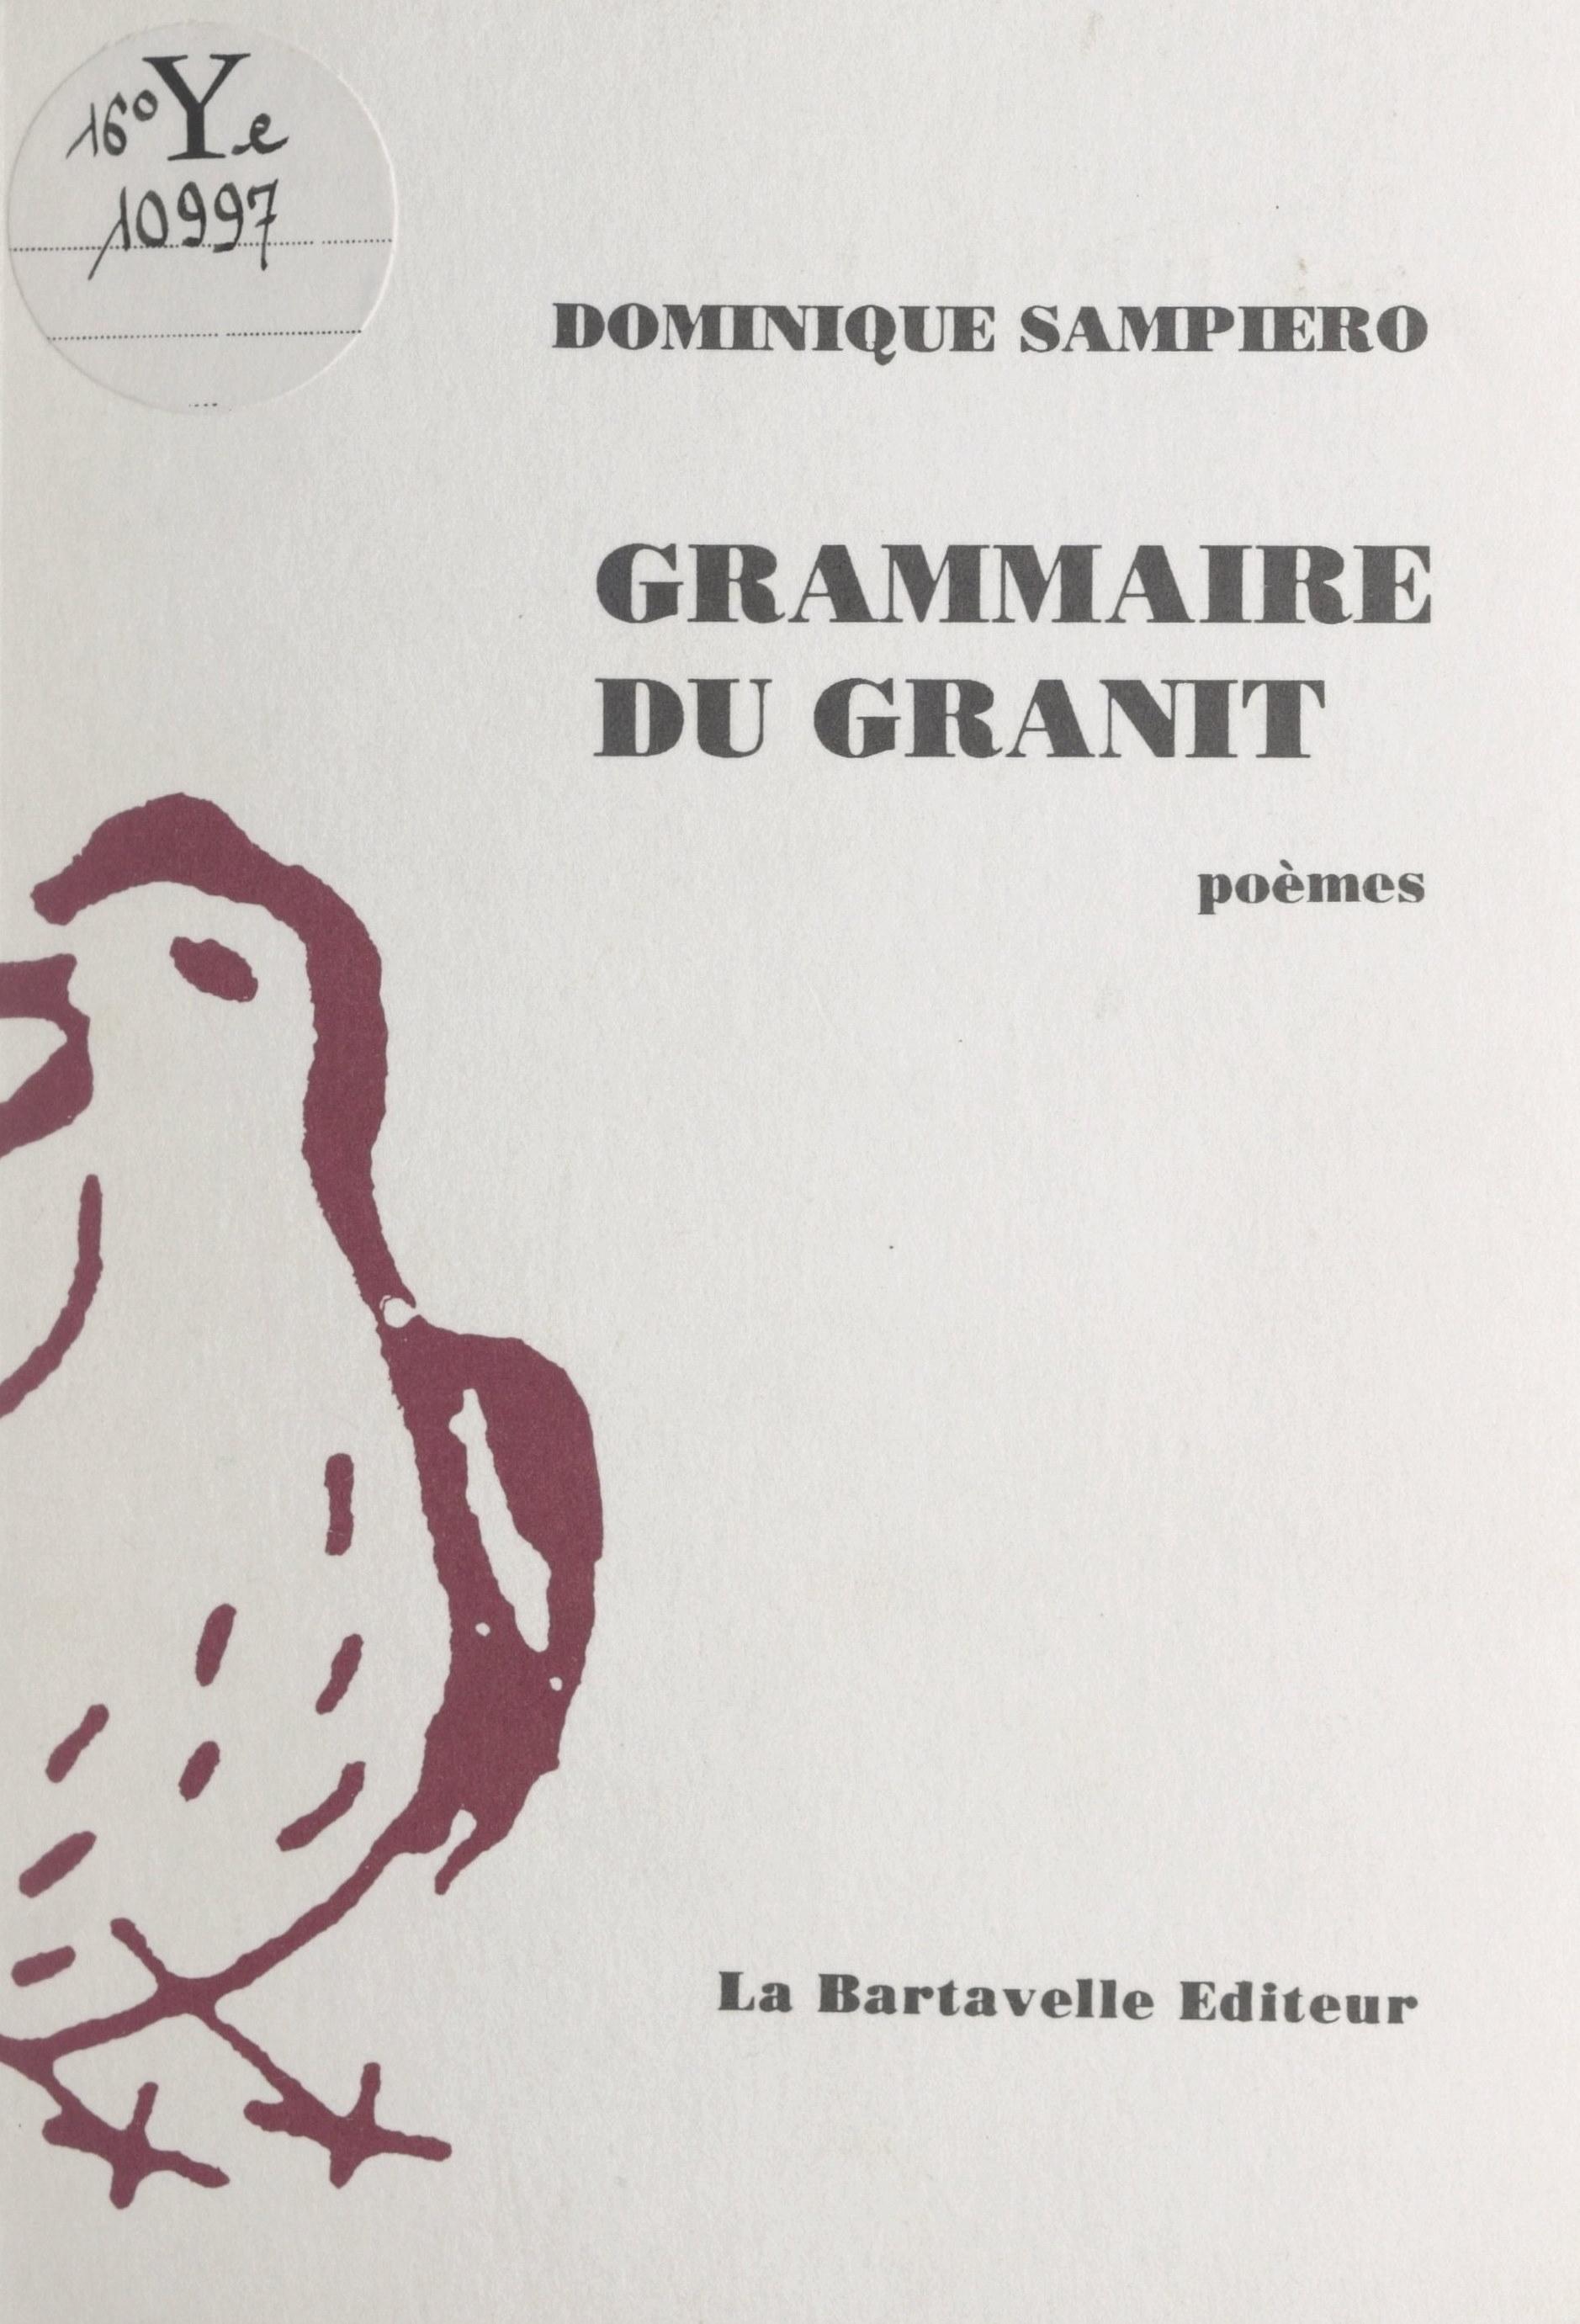 Grammaire du granit